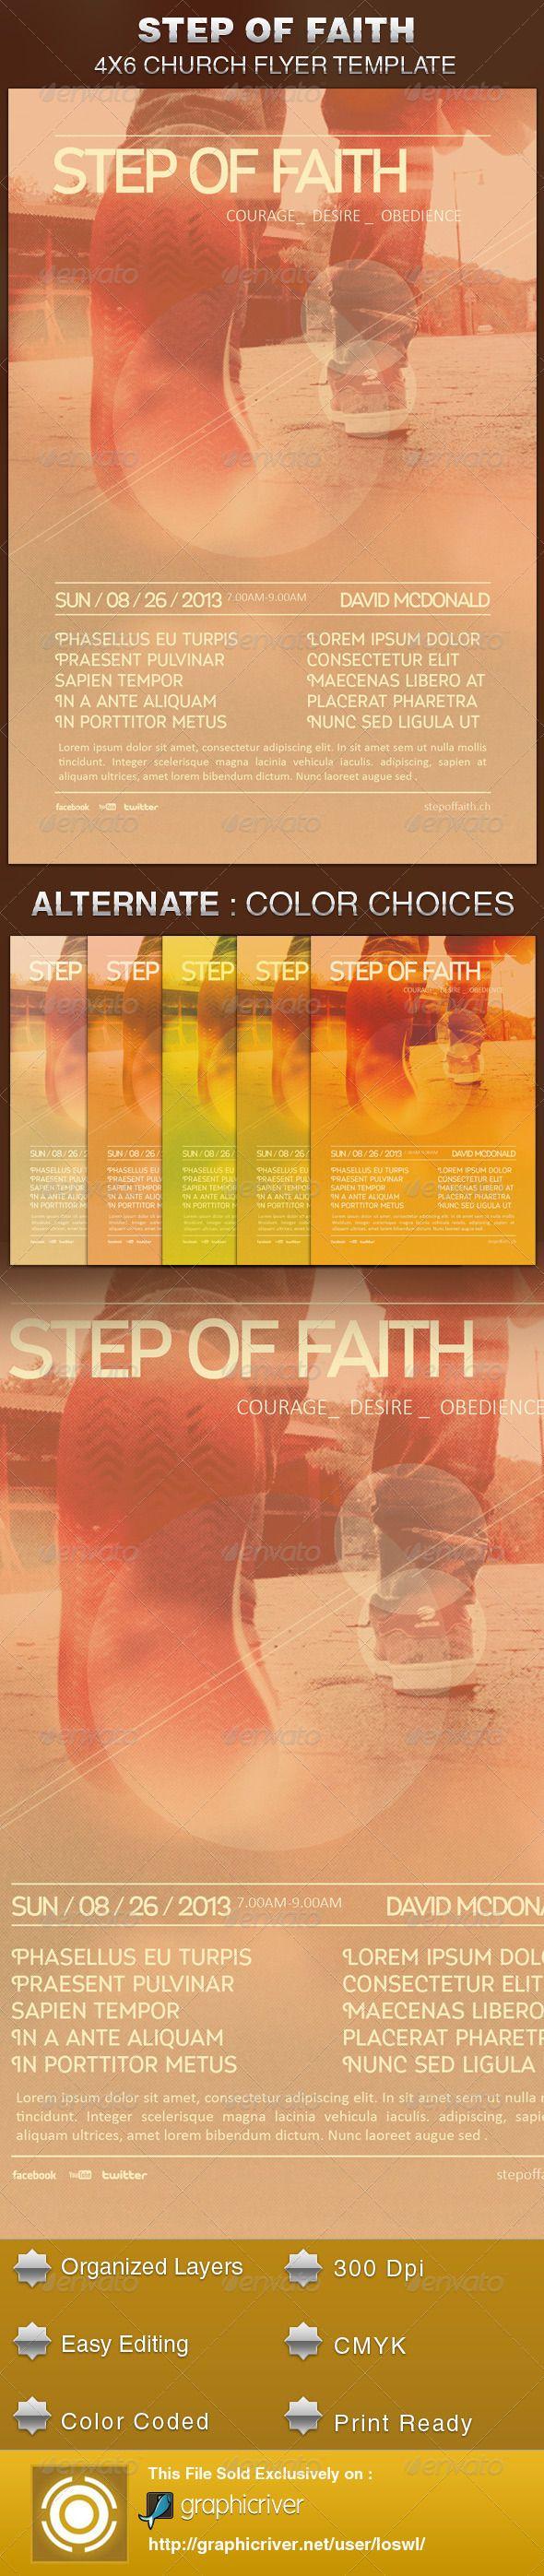 church revival flyer template